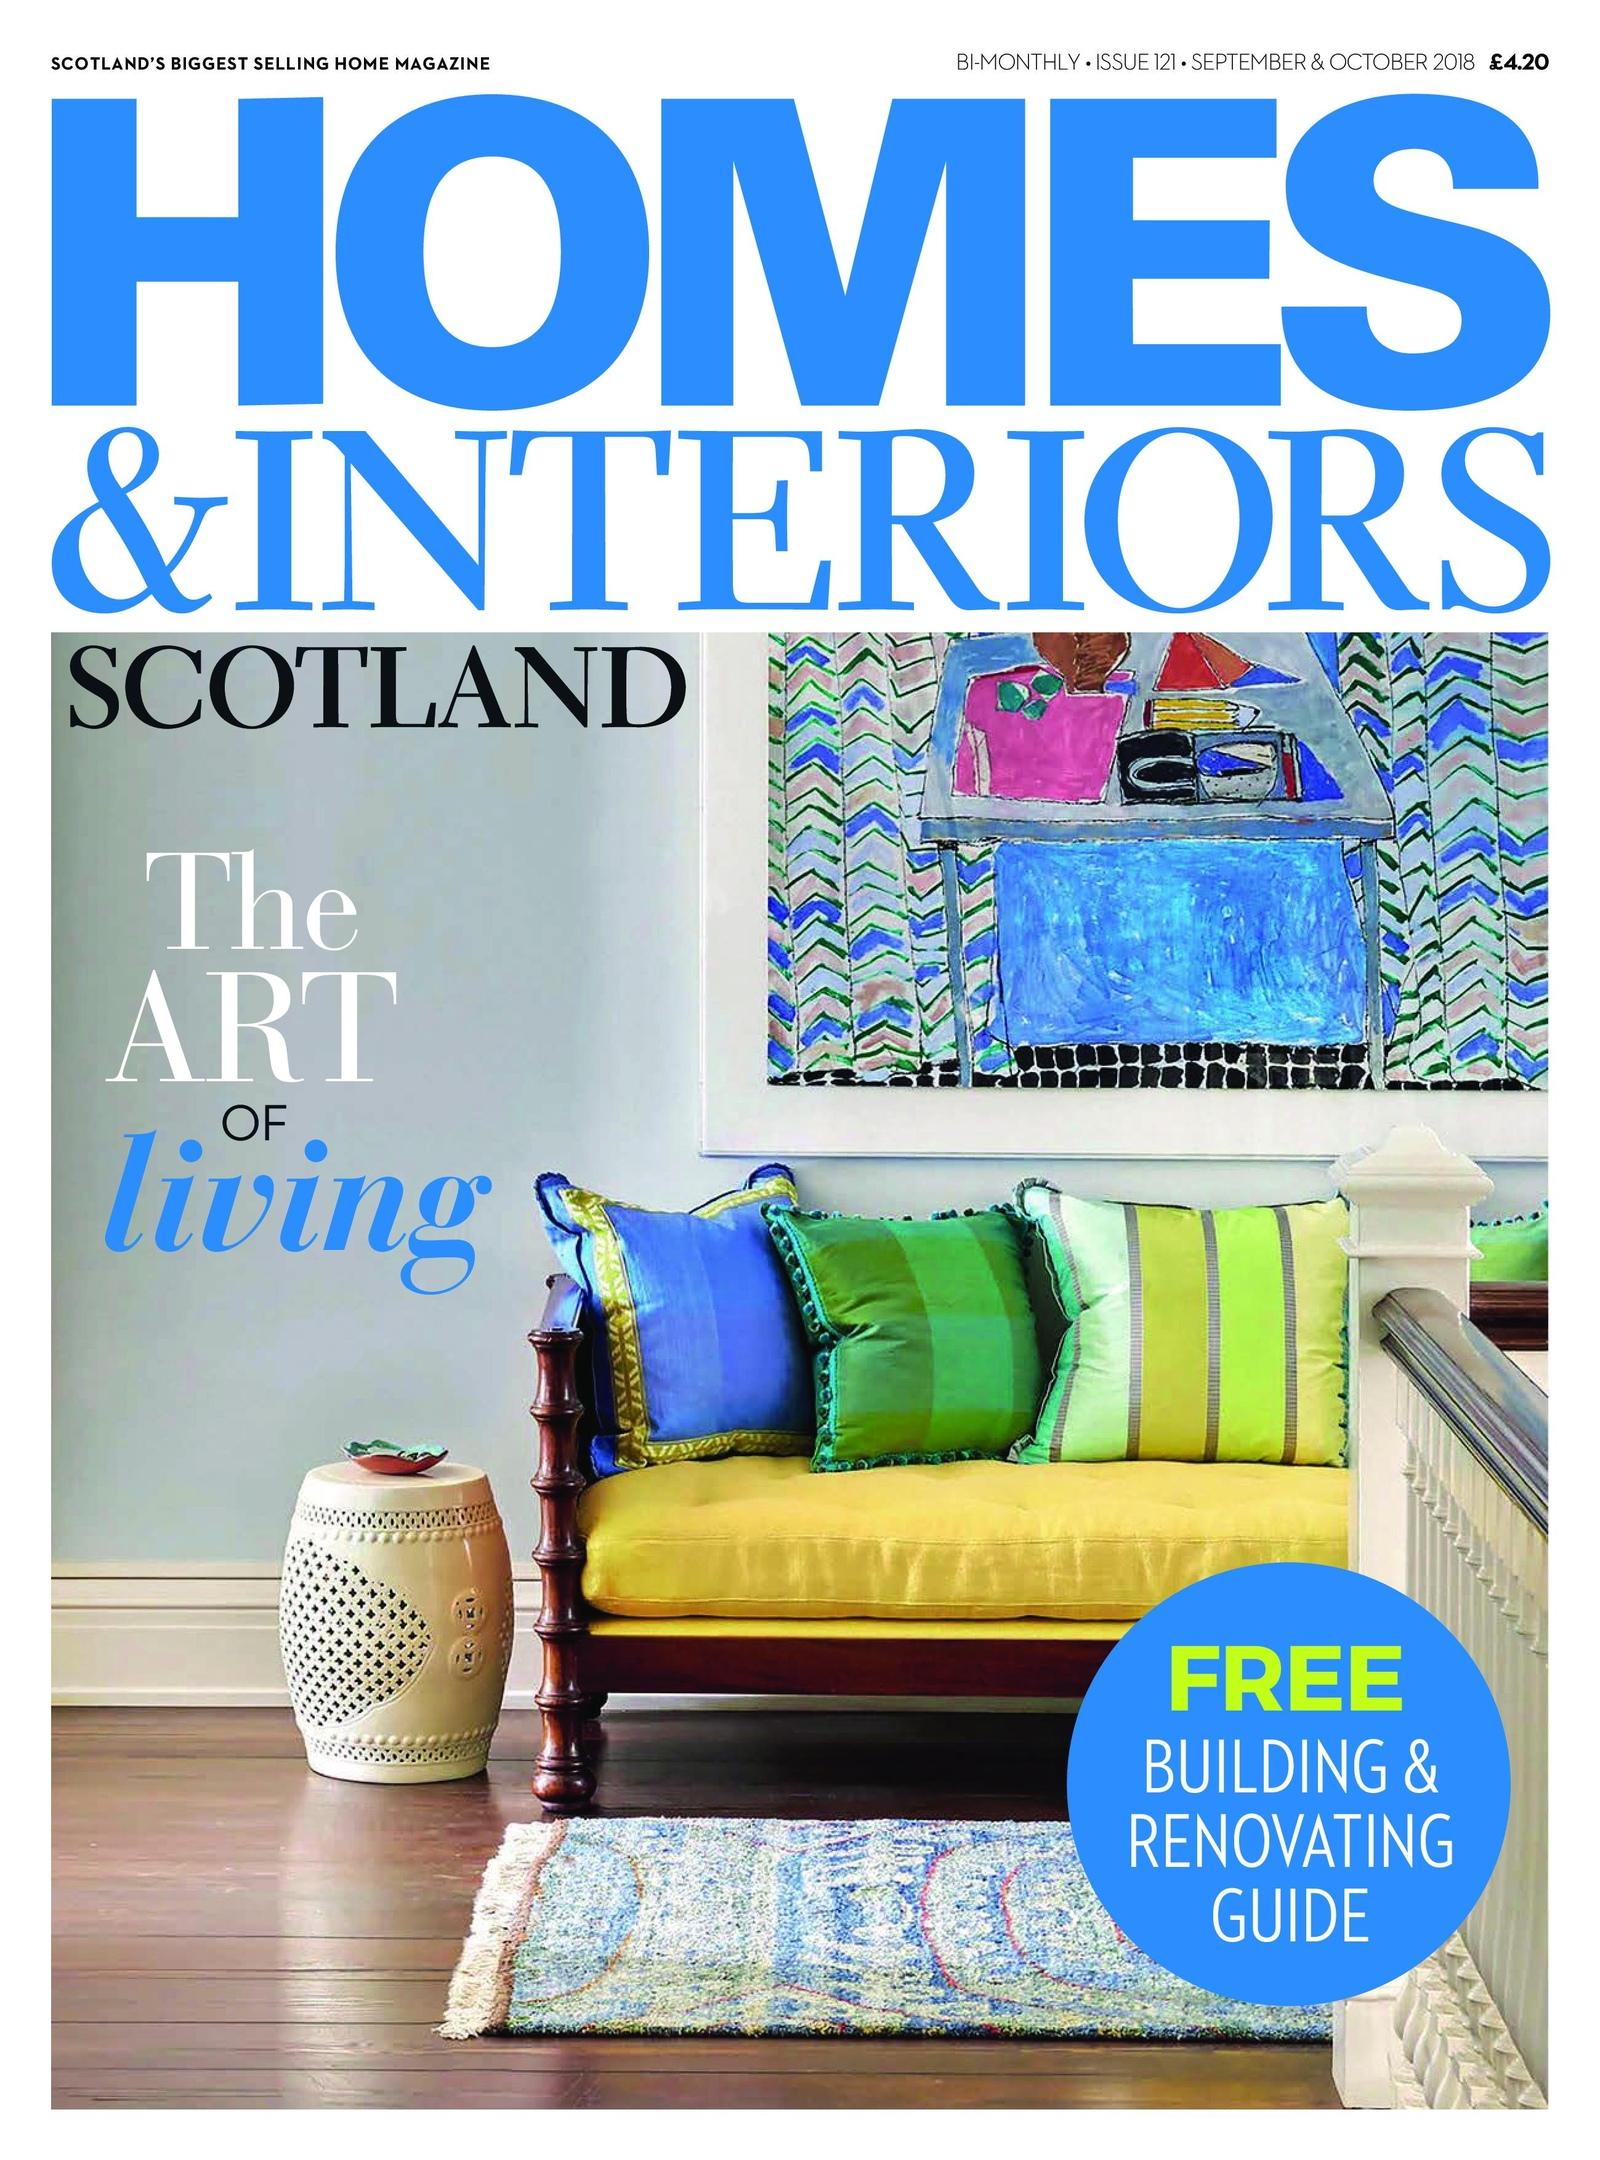 Homes & Interiors Scotland – September-October 2018